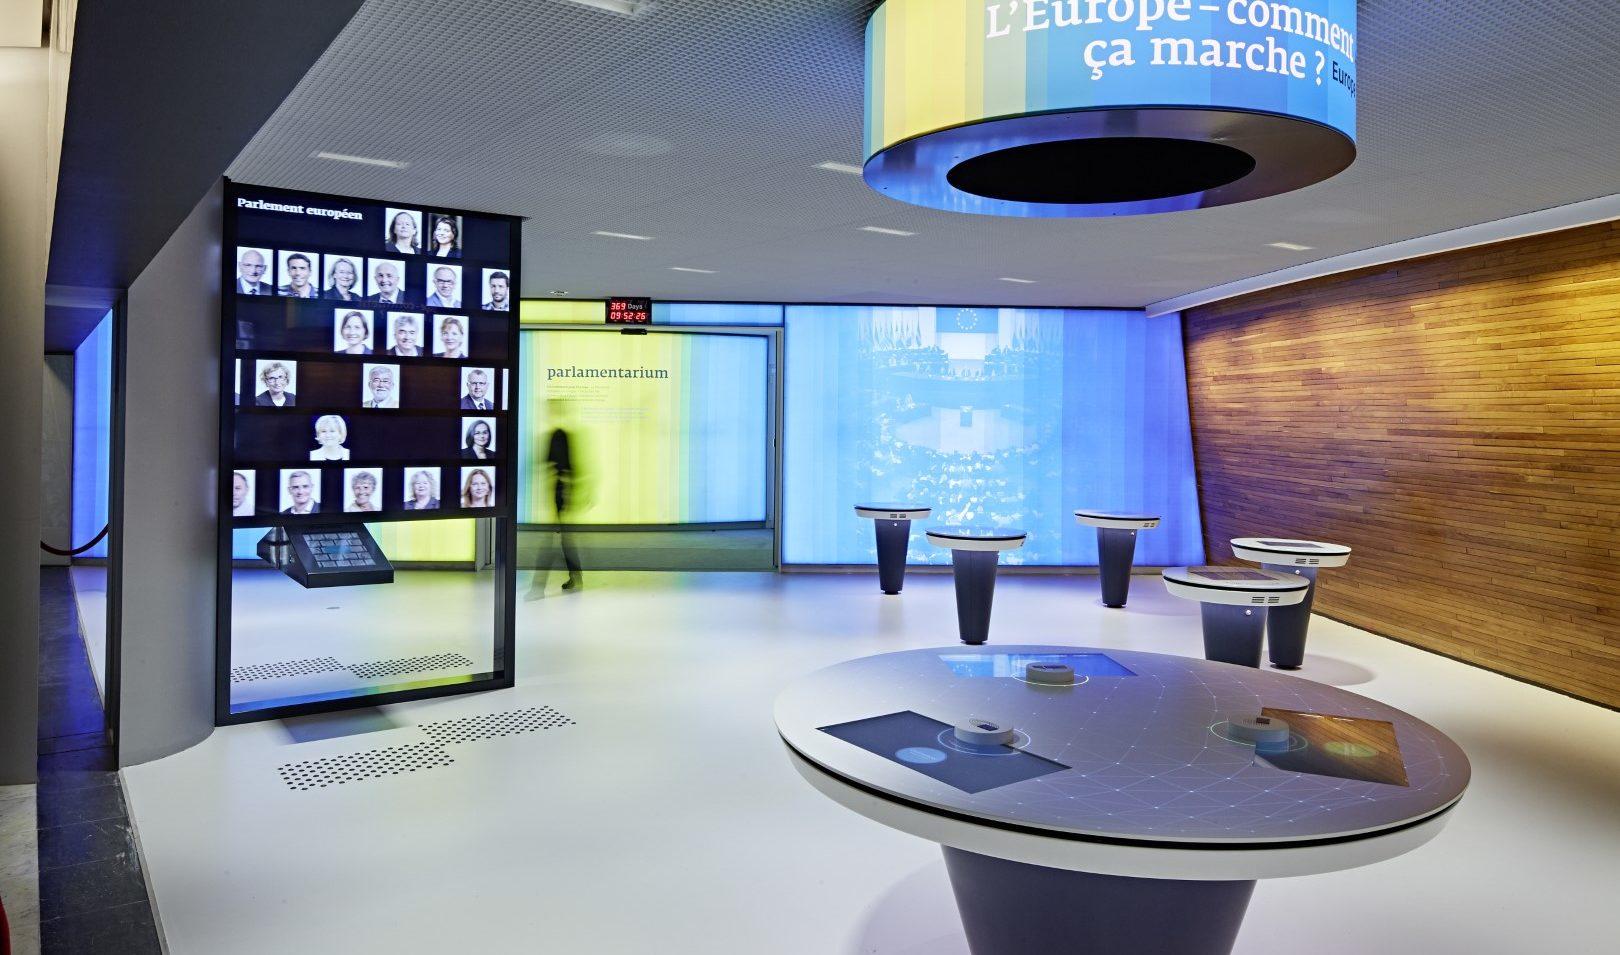 parlamentarium – parlement européen